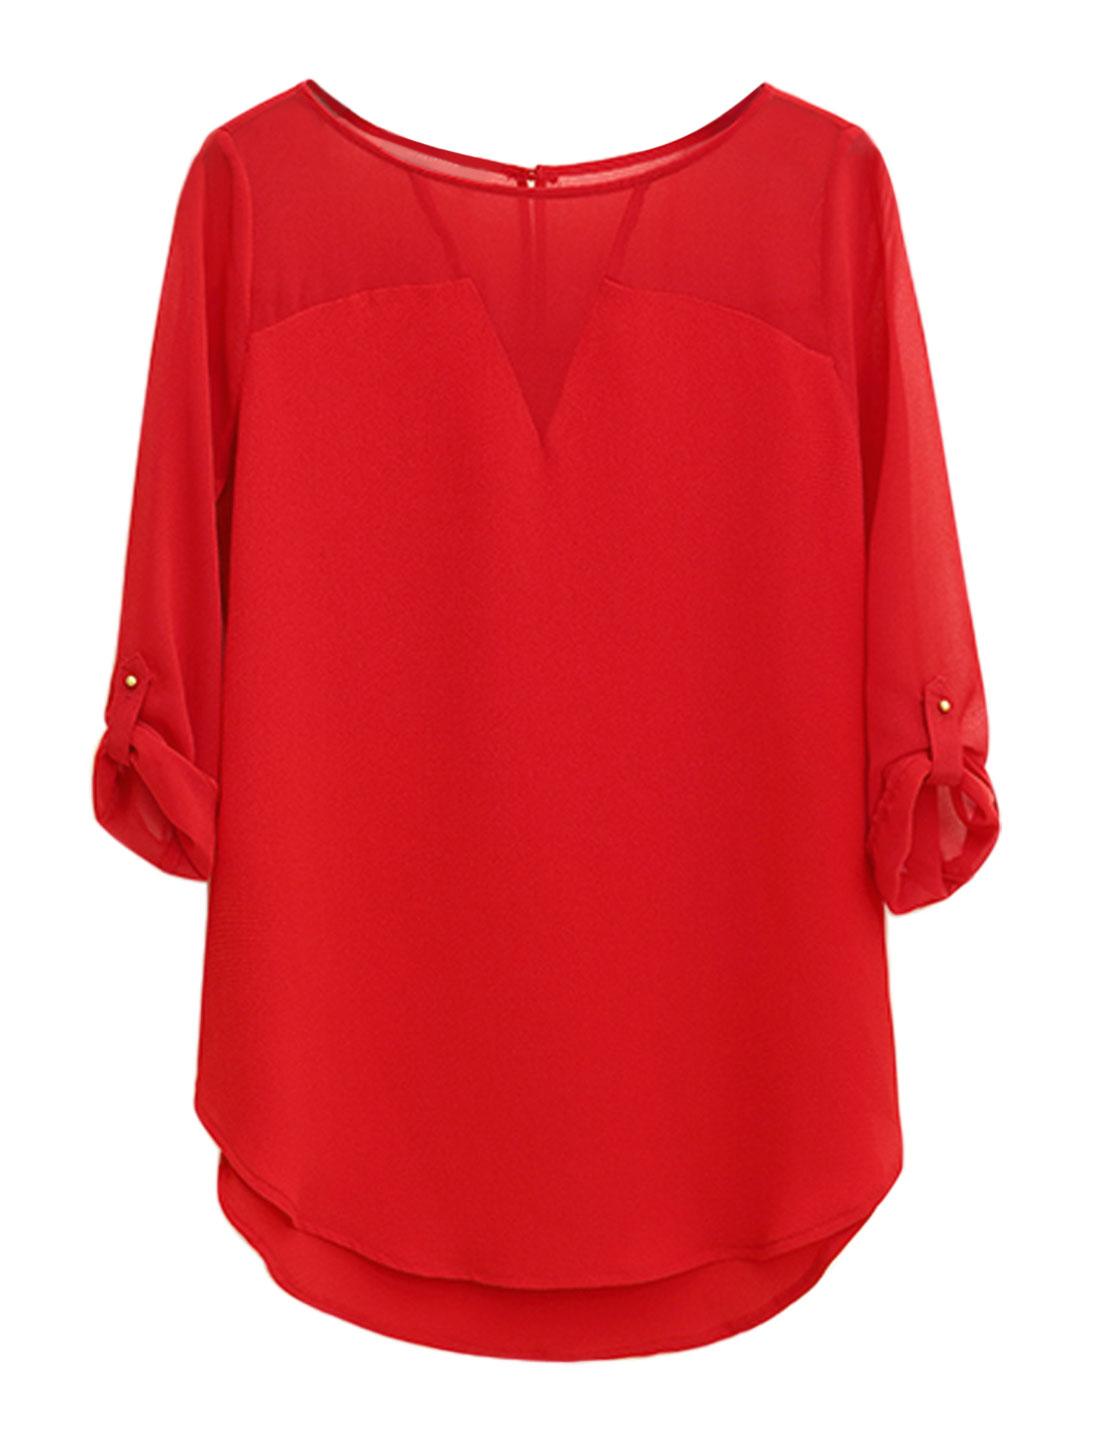 Women Roll Up Sleeves Round Hem Paneled Tunic Chiffon Top Red M